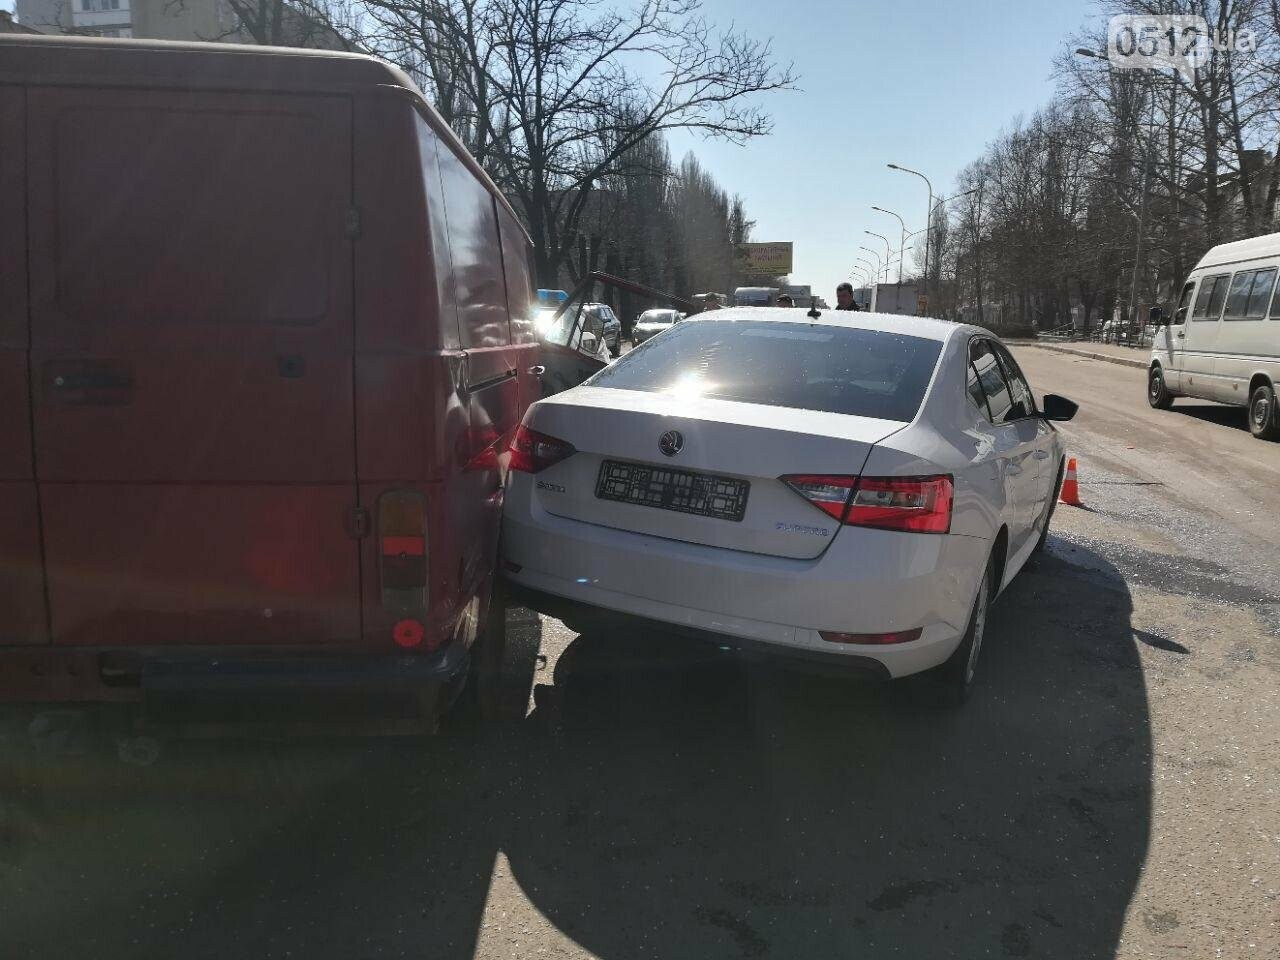 Авария в Николаеве: в результате ДТП пострадало четыре человека, среди них ребенок, - ФОТО, фото-1